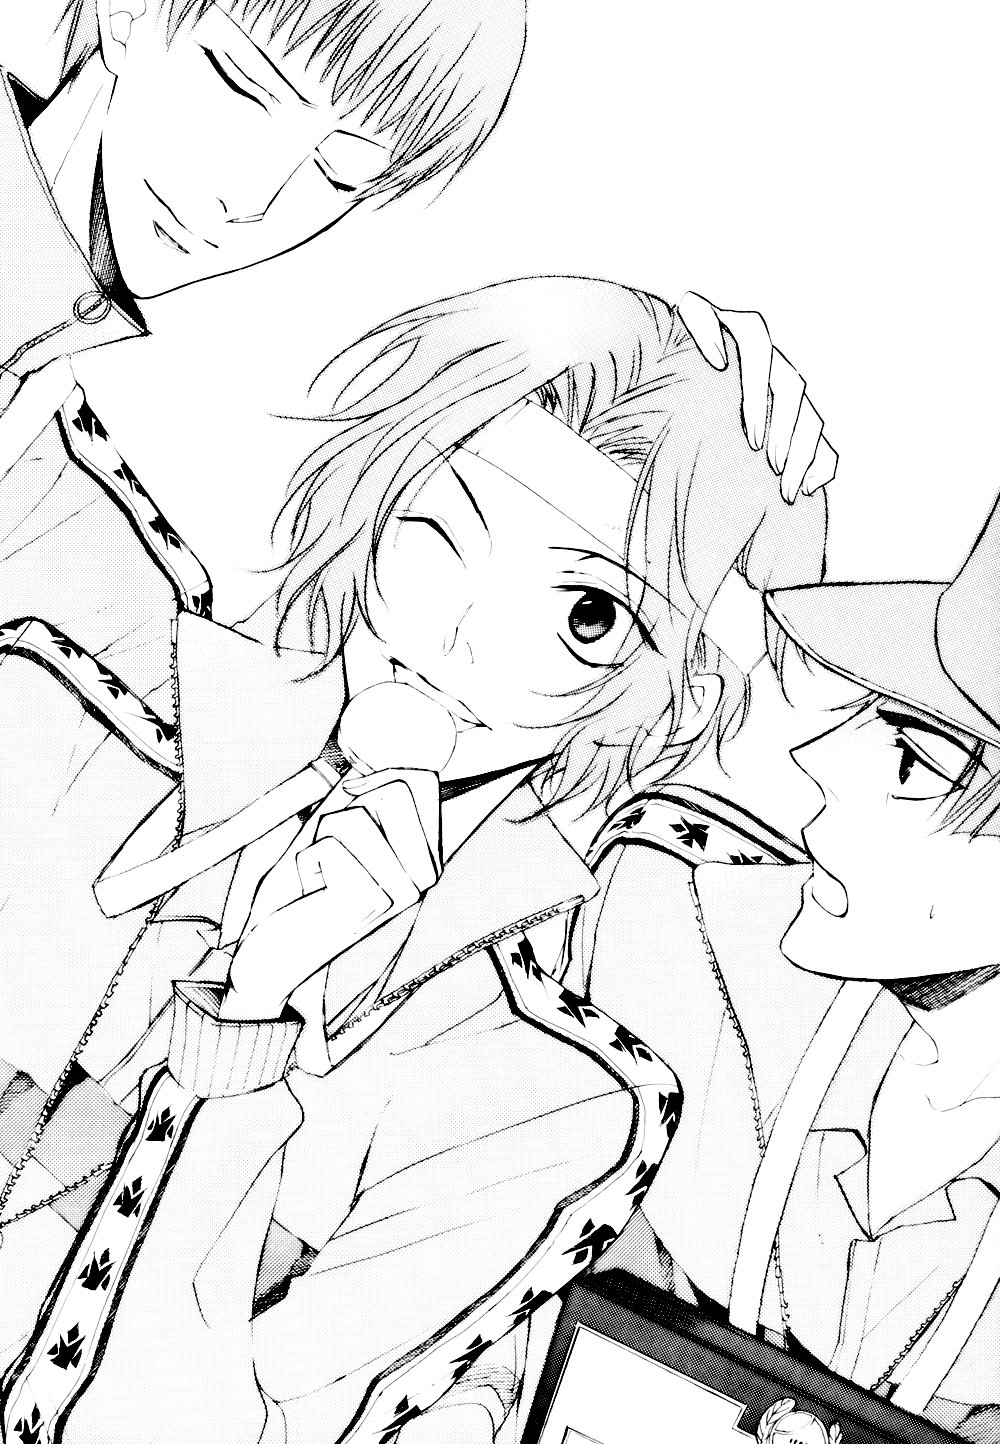 Manga, Otaku And Videos On Pinterest